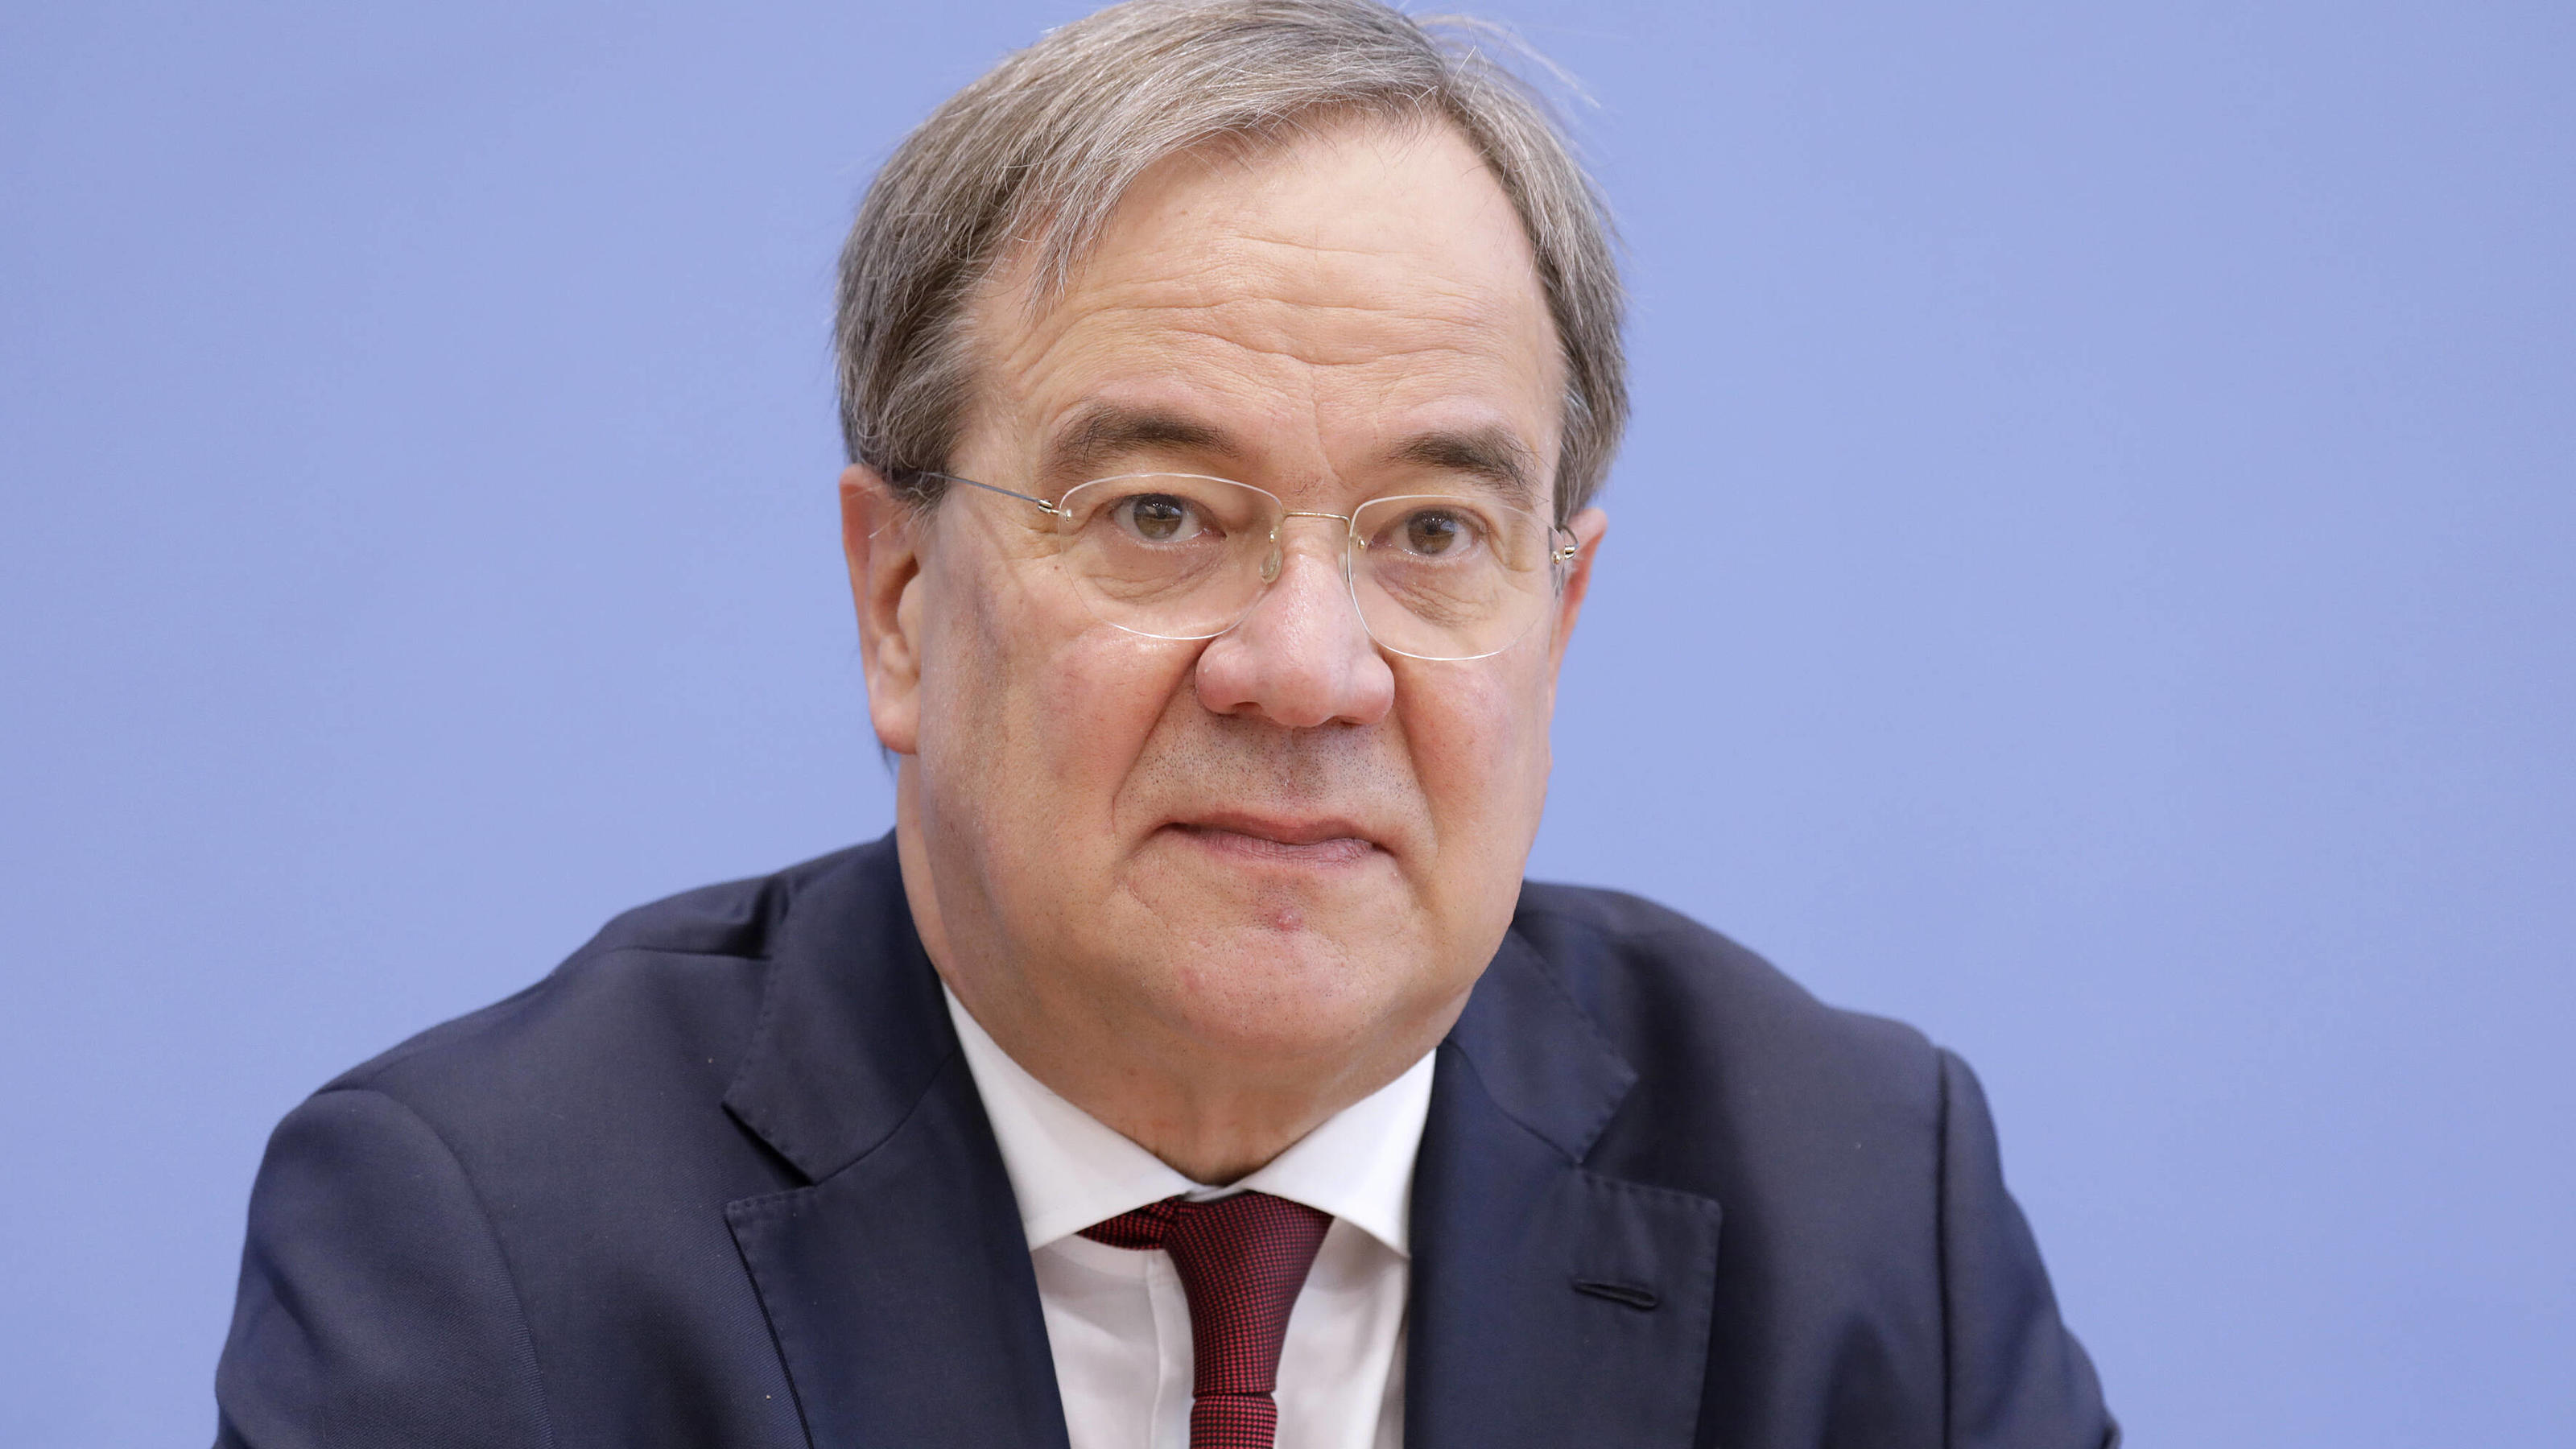 Armin Laschet Ministerpräsident